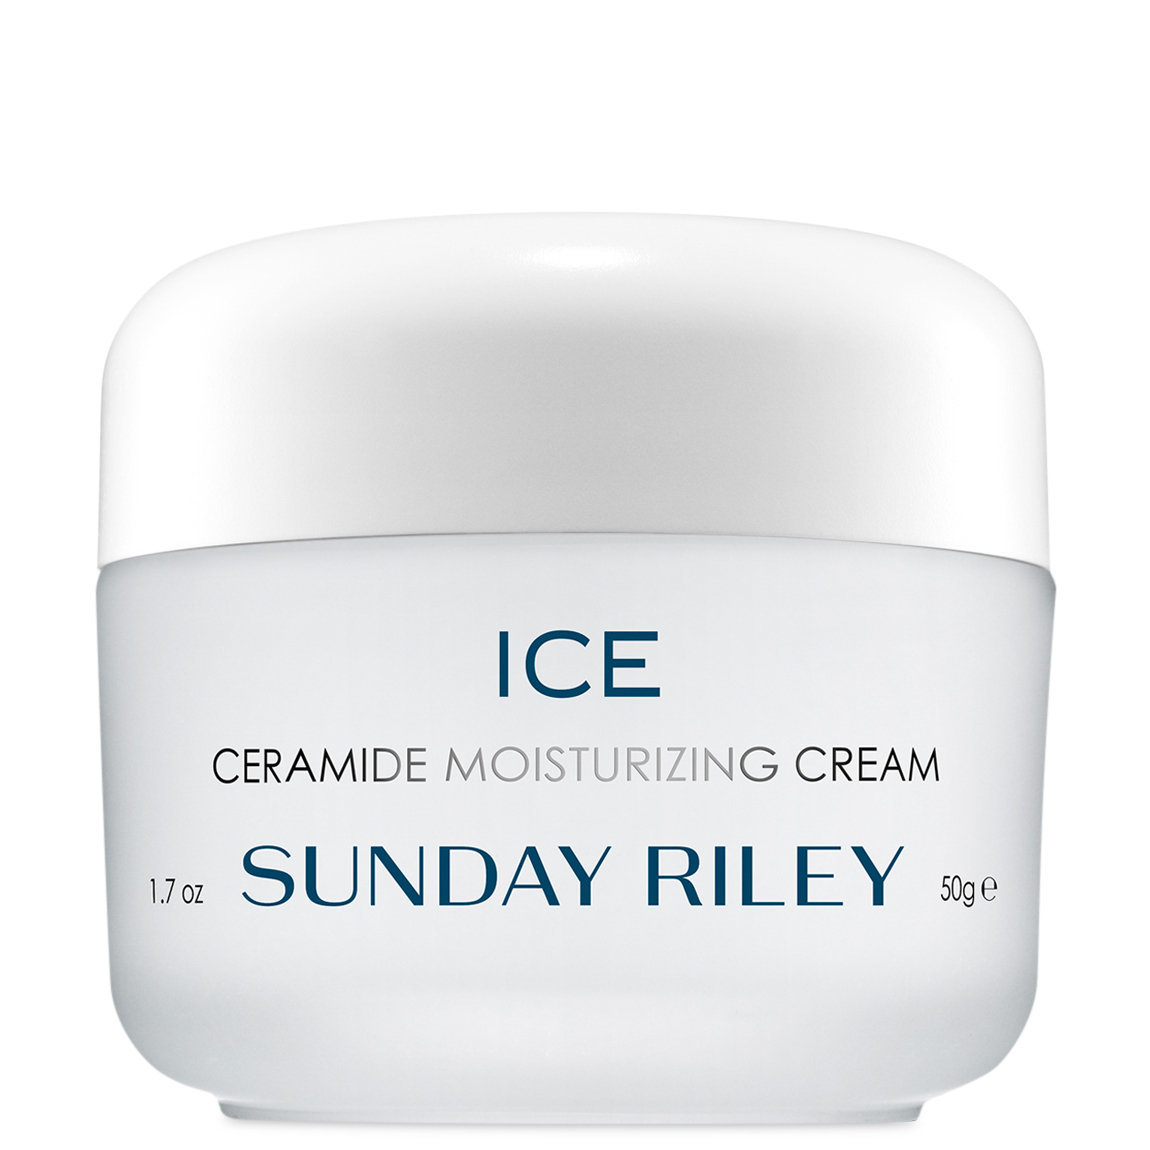 Sunday Riley Ice Ceramide Moisturizing Cream 1.7 oz alternative view 1 - product swatch.